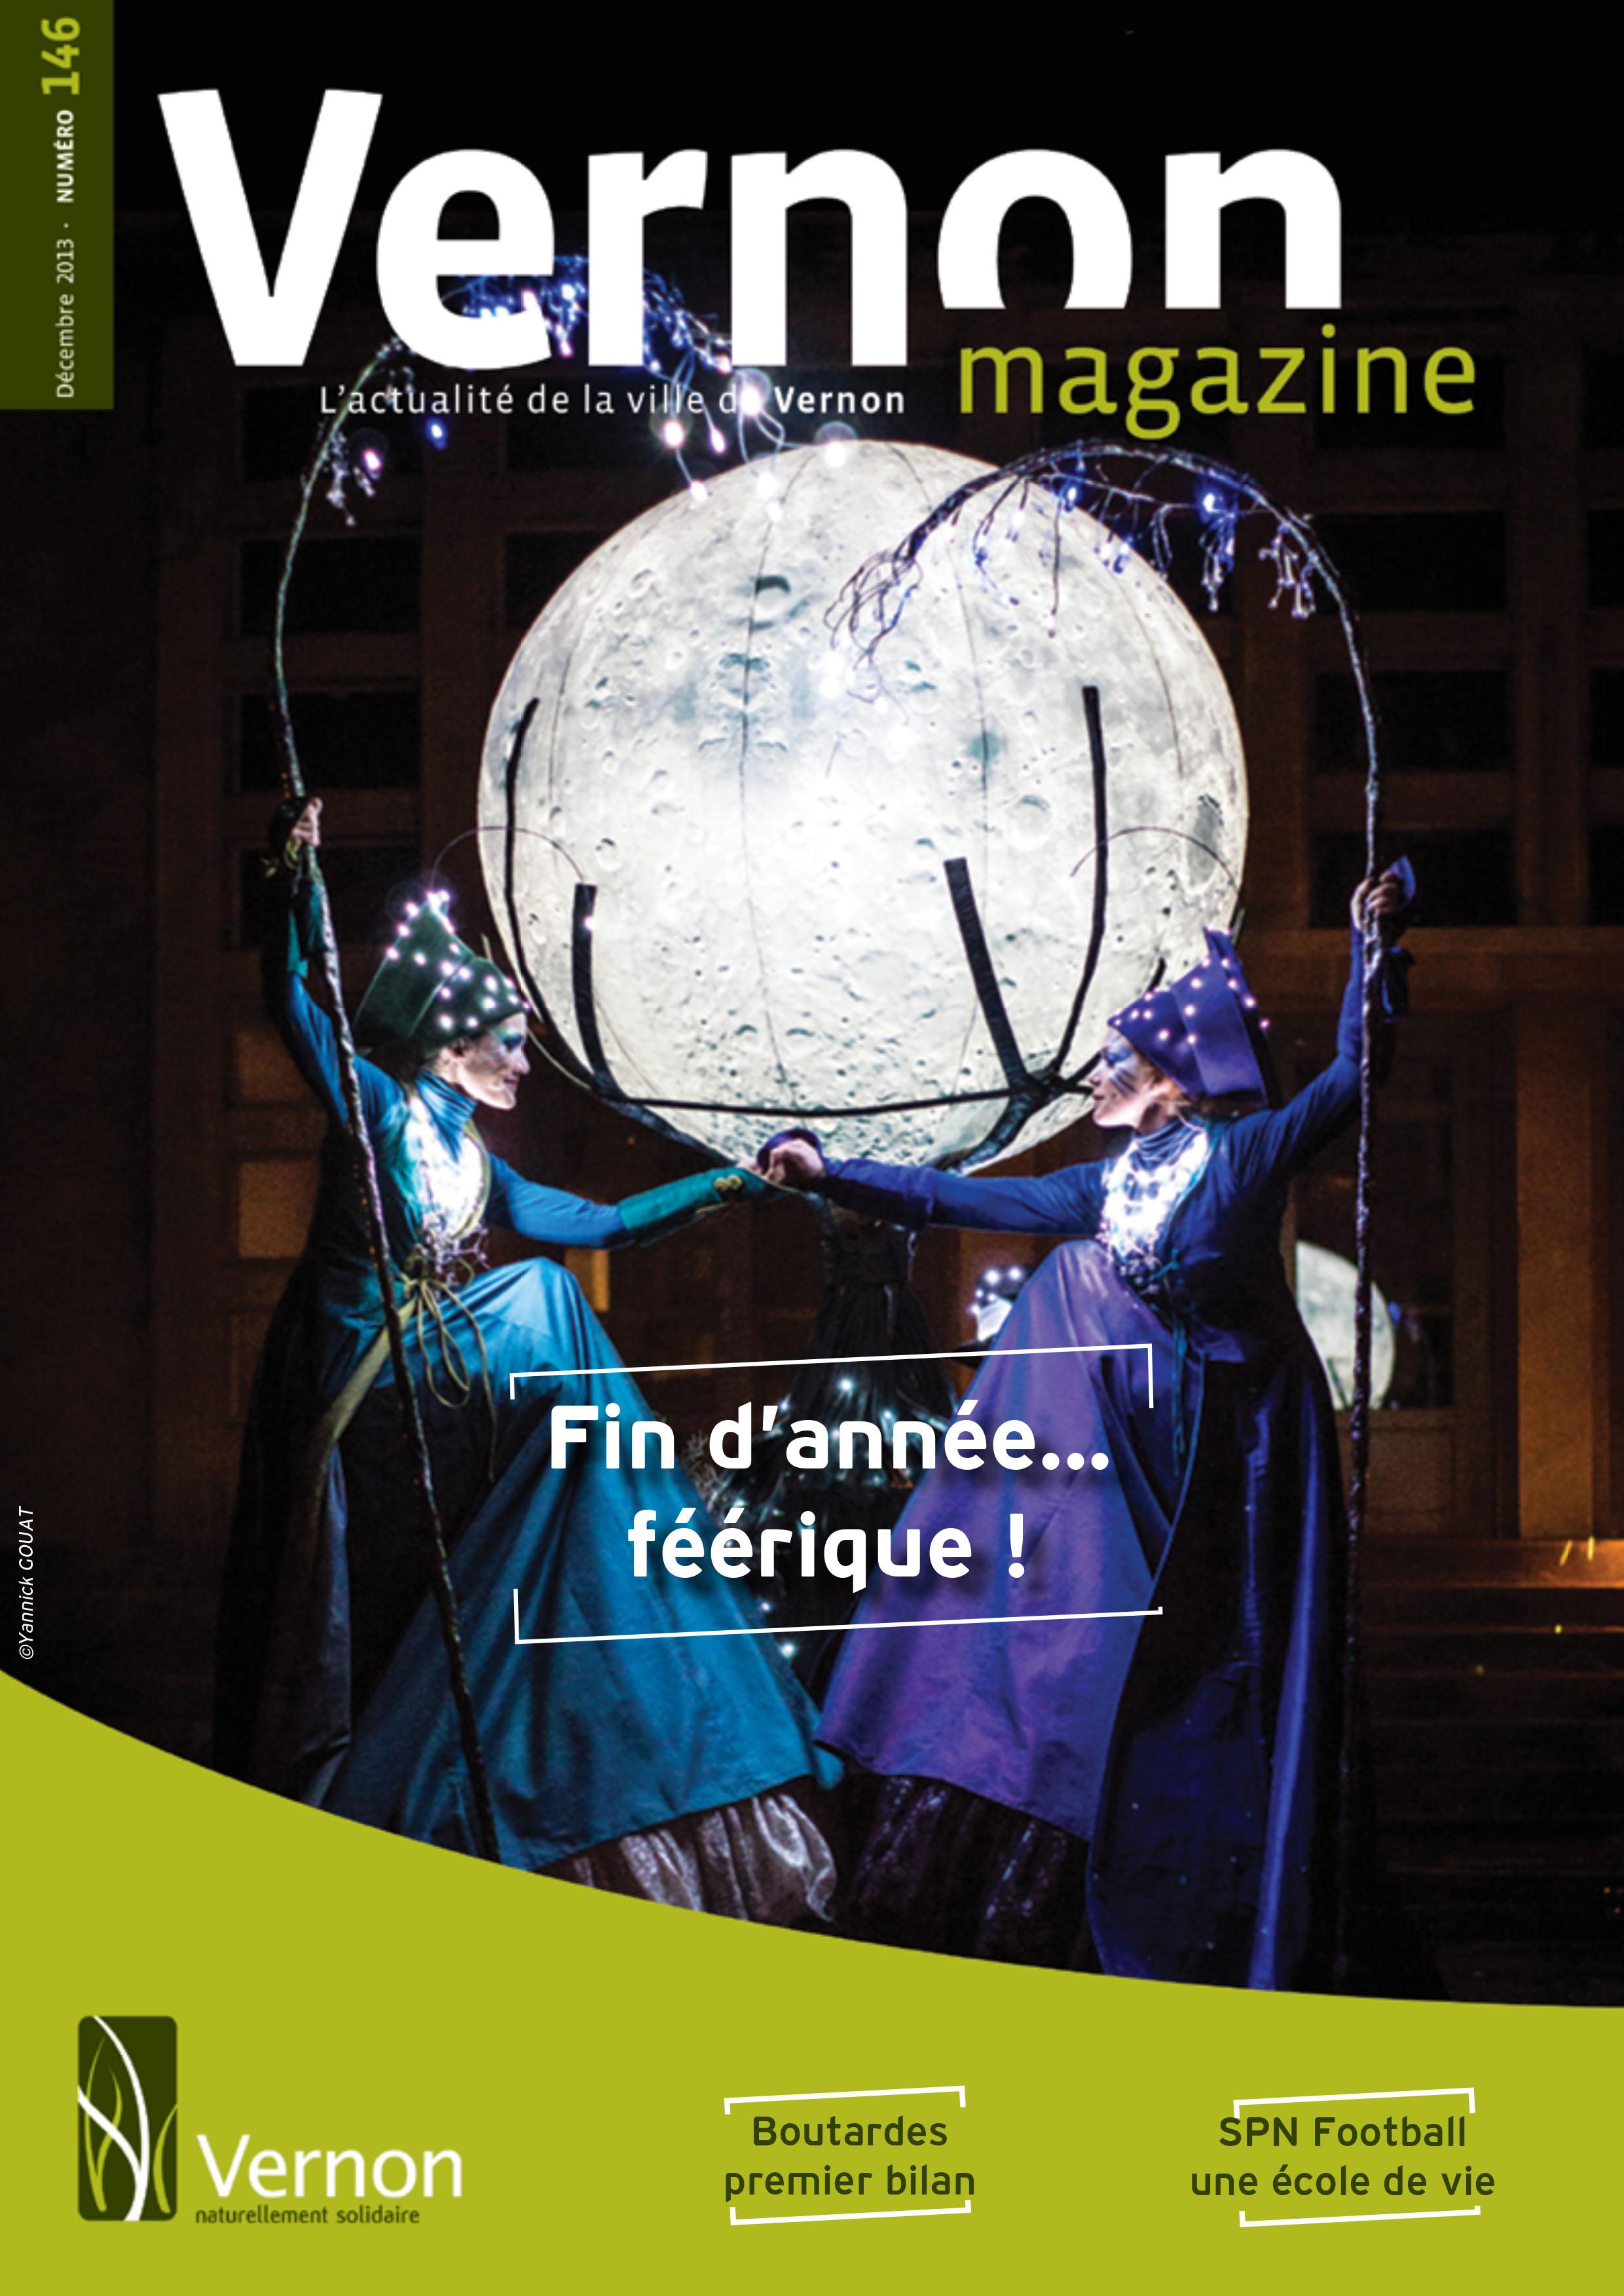 vernonmagazinepage1